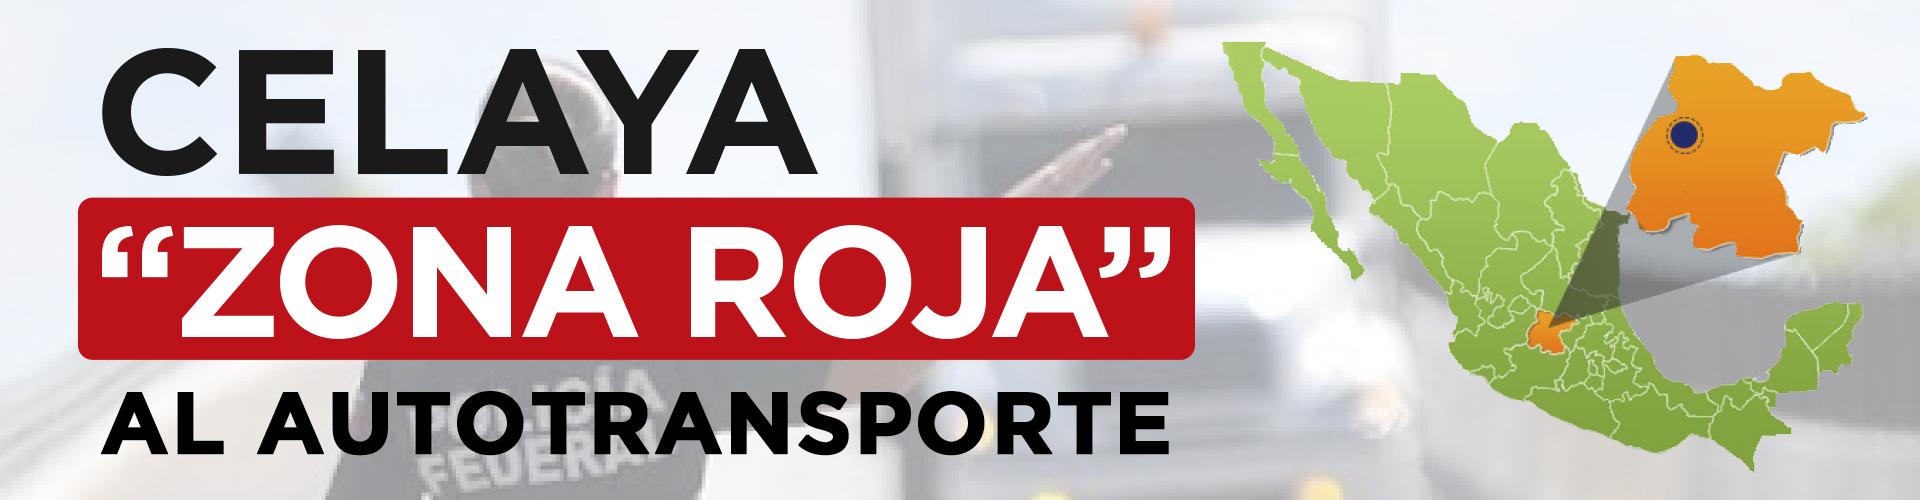 Robo al autotransporte de carga